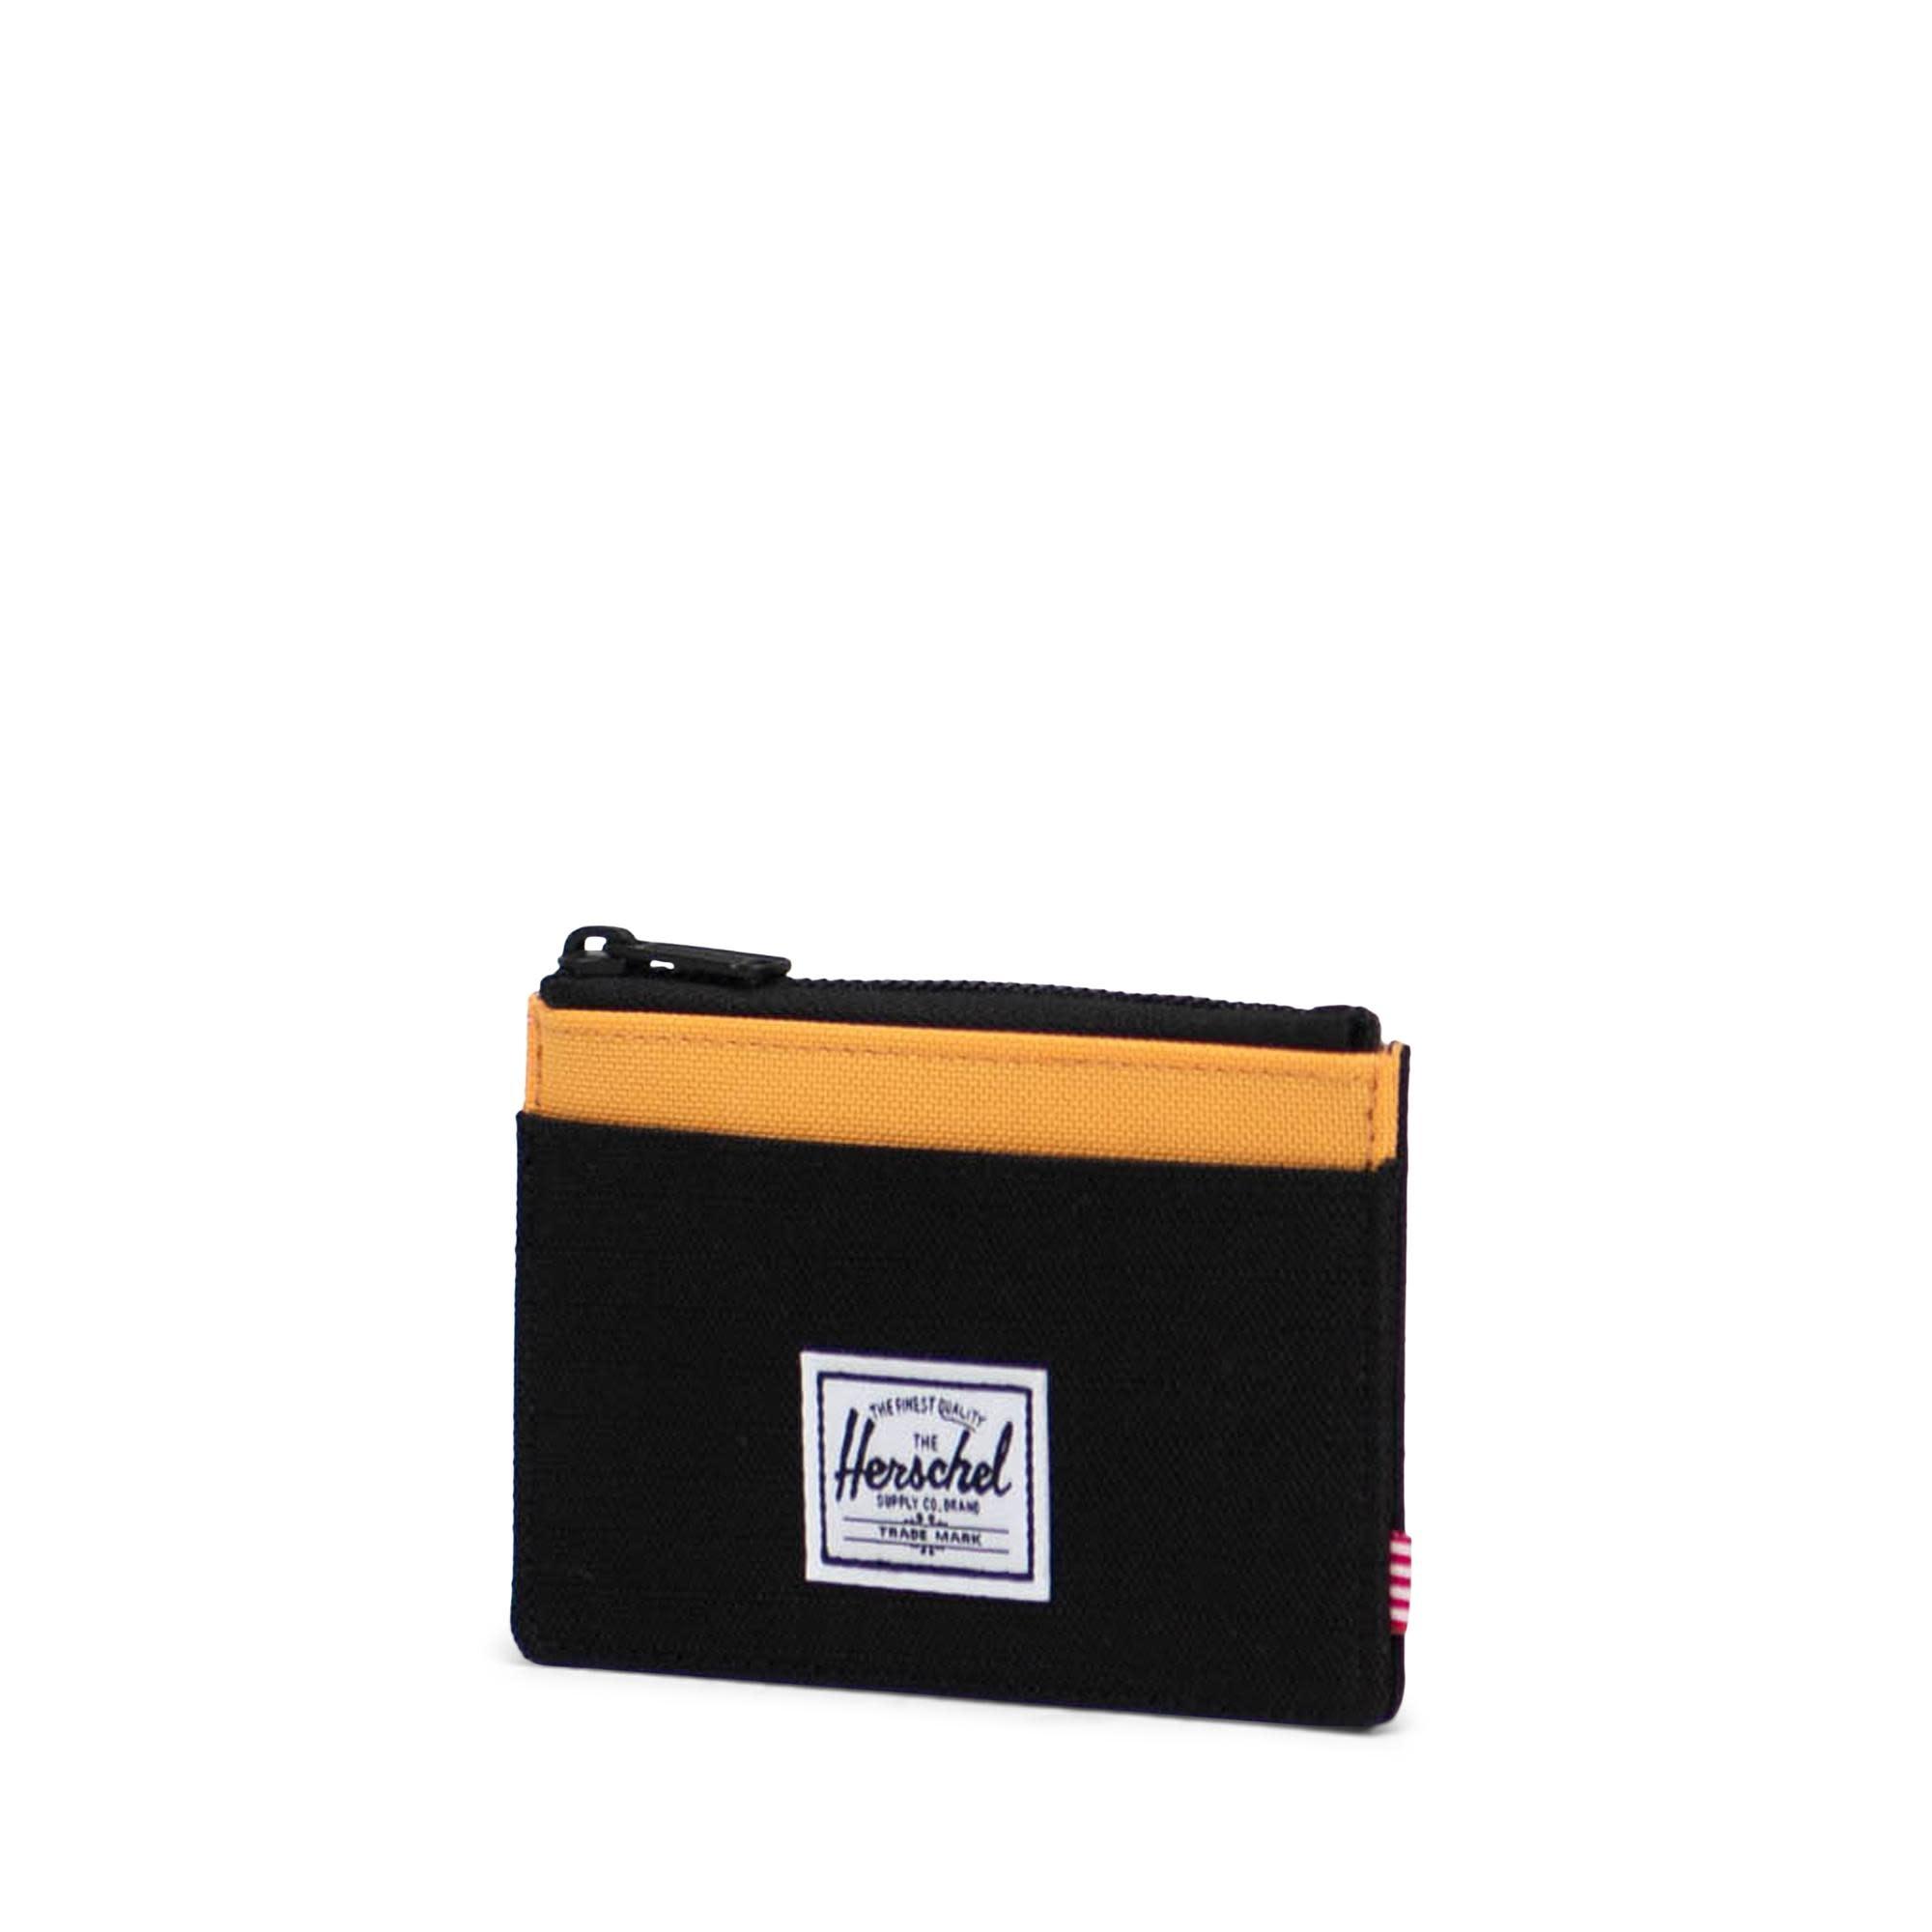 Herschel Supply Co. Herschel Oscar Wallet - Black Crosshatch/Black Ripstop/Blazing Orange/RFID